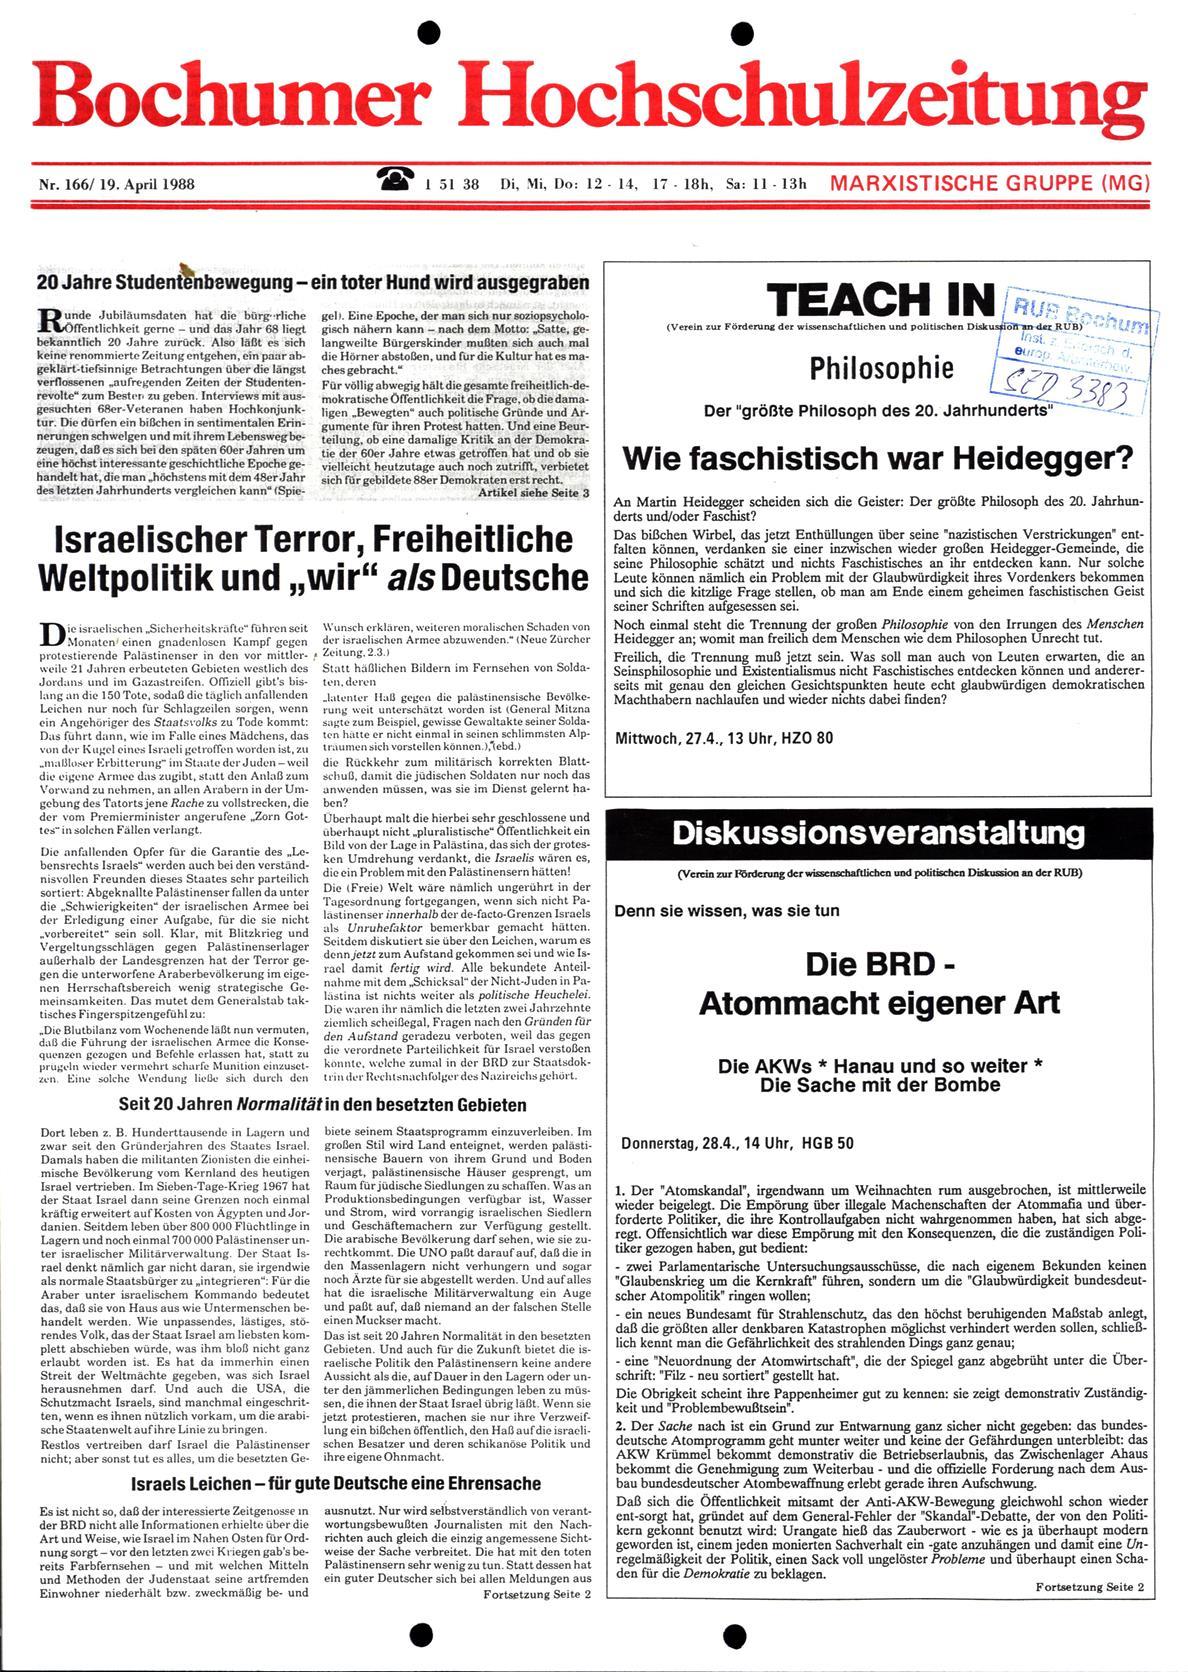 Bochum_BHZ_19880419_166_001